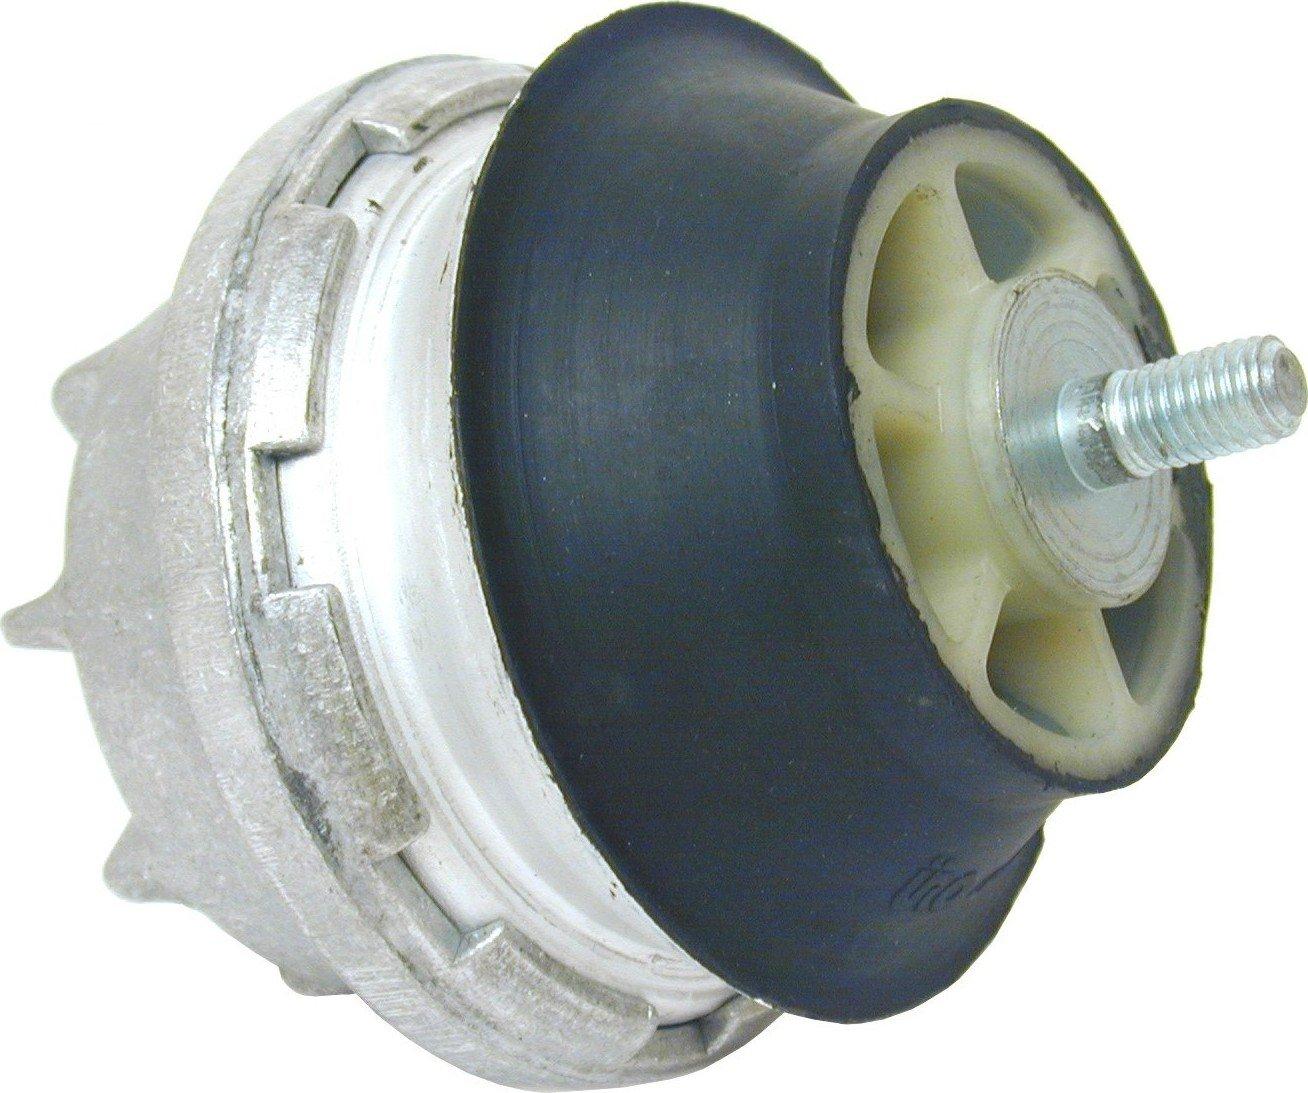 2008-2018 Rear 220mm for KTM 250 XC-W EBC Brake Rotor E-Start